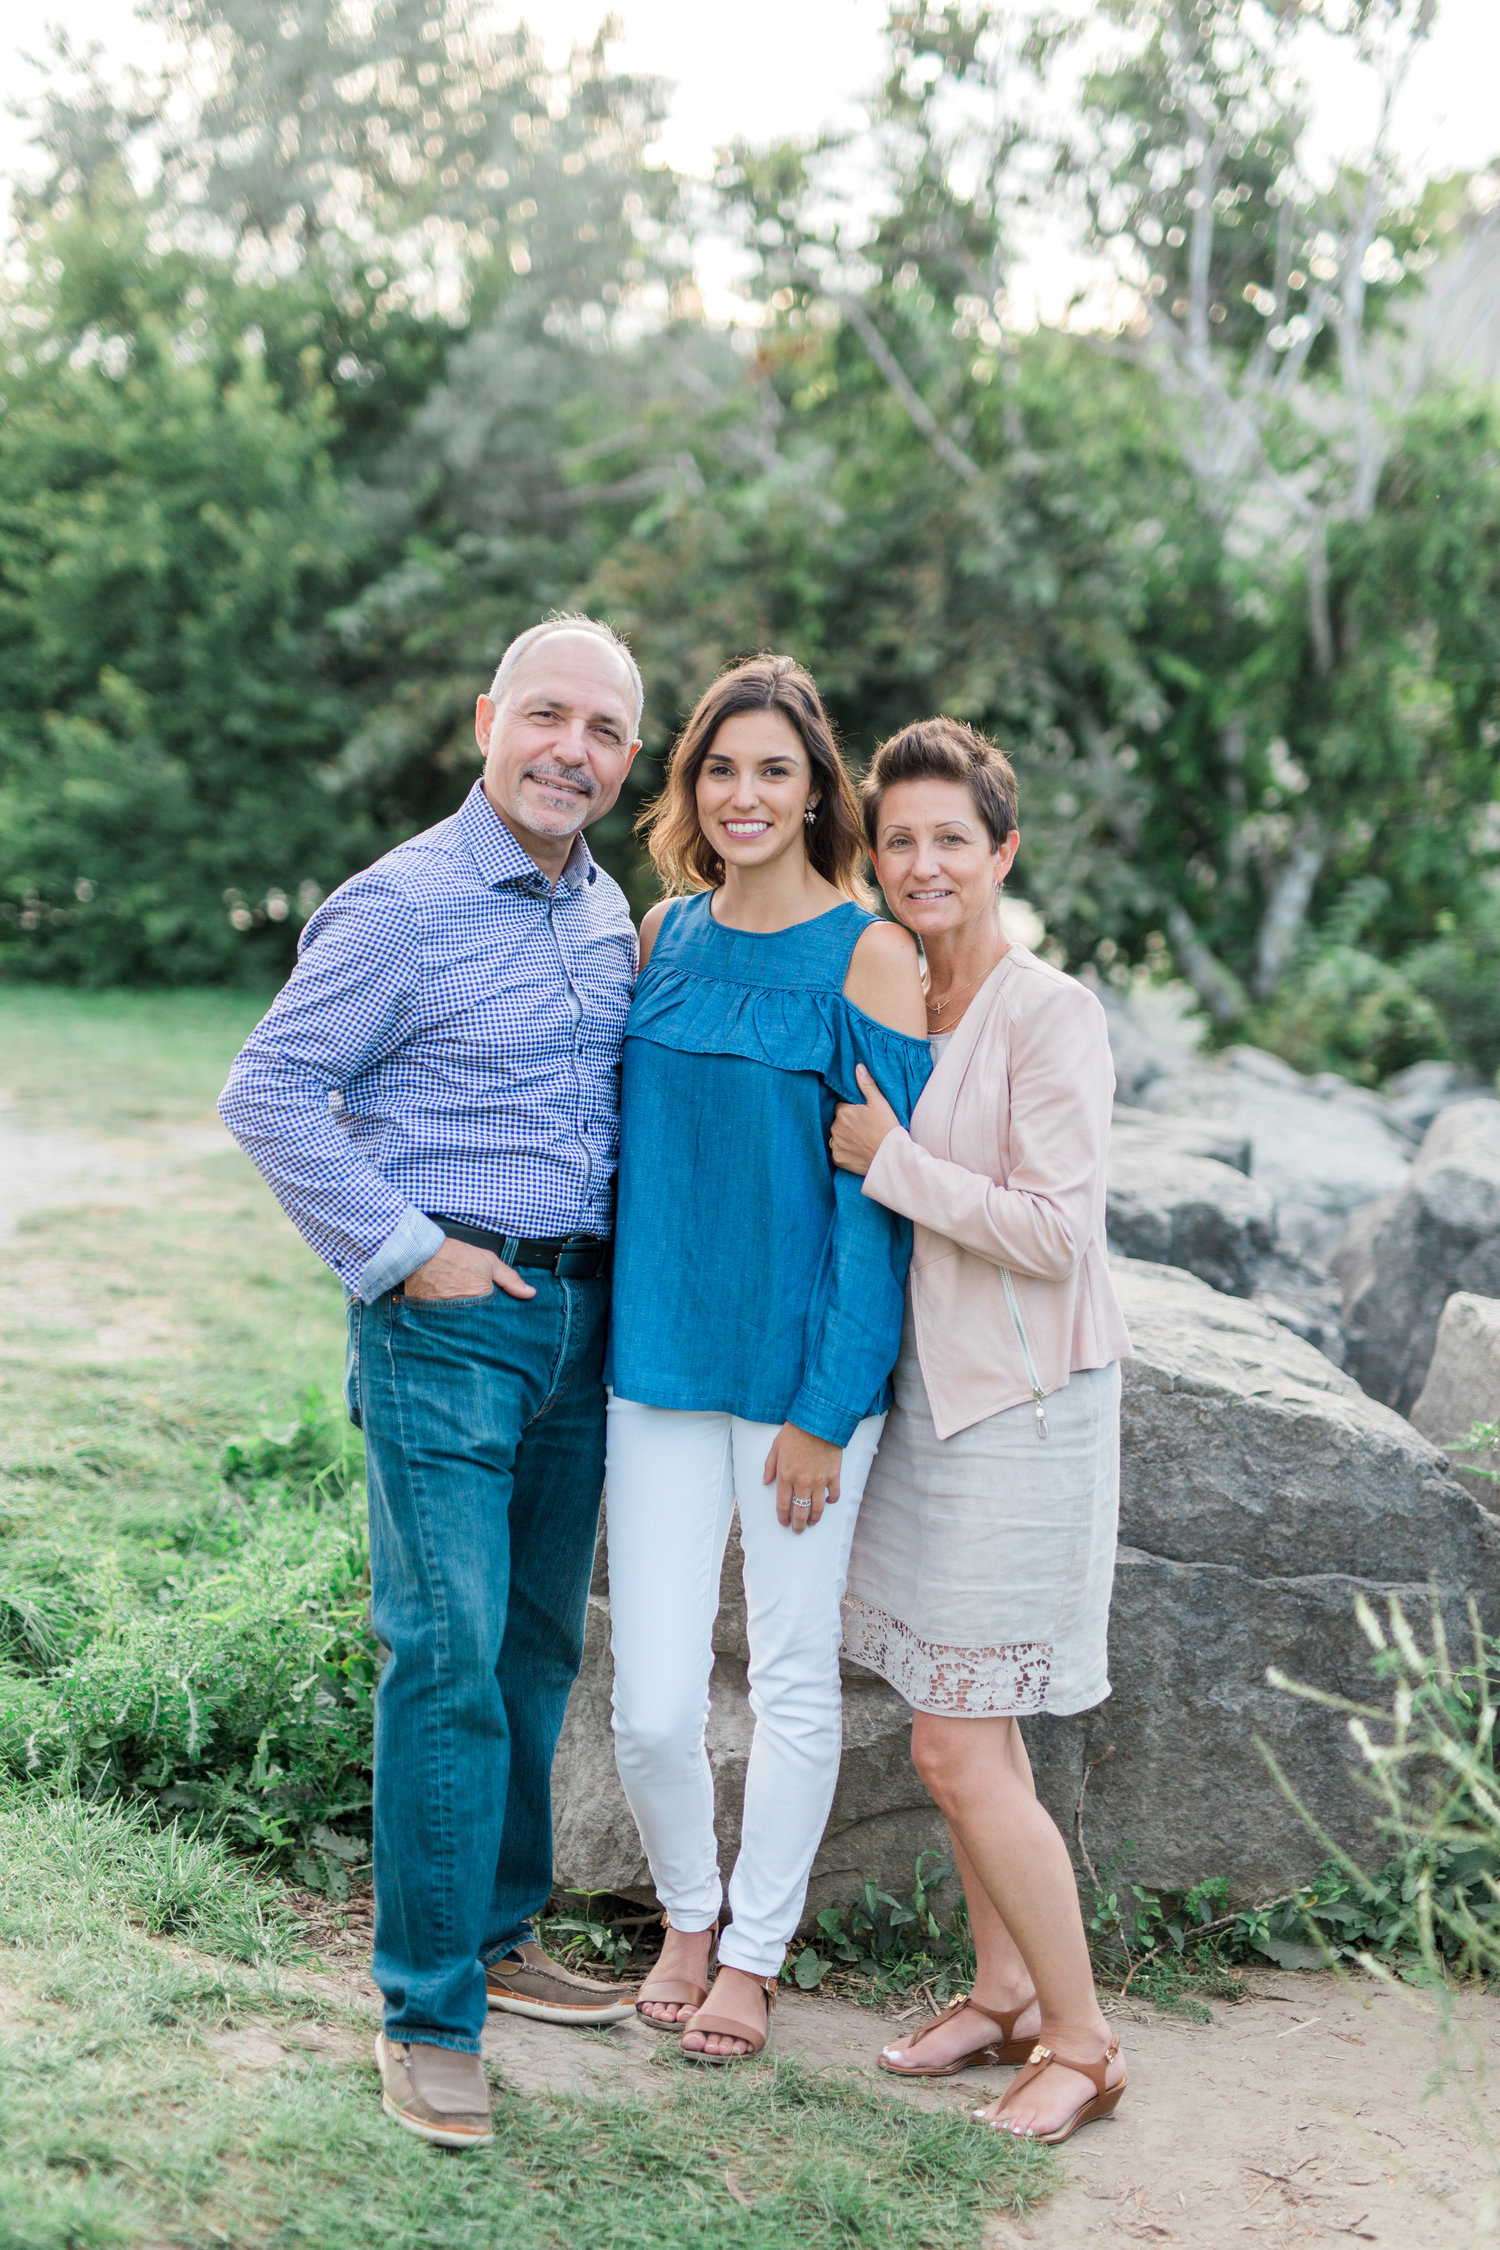 Danielle-Giroux-Amir-Golbazi-Genua-Family-Photography-Scarborough-Bluffs-9121.jpg